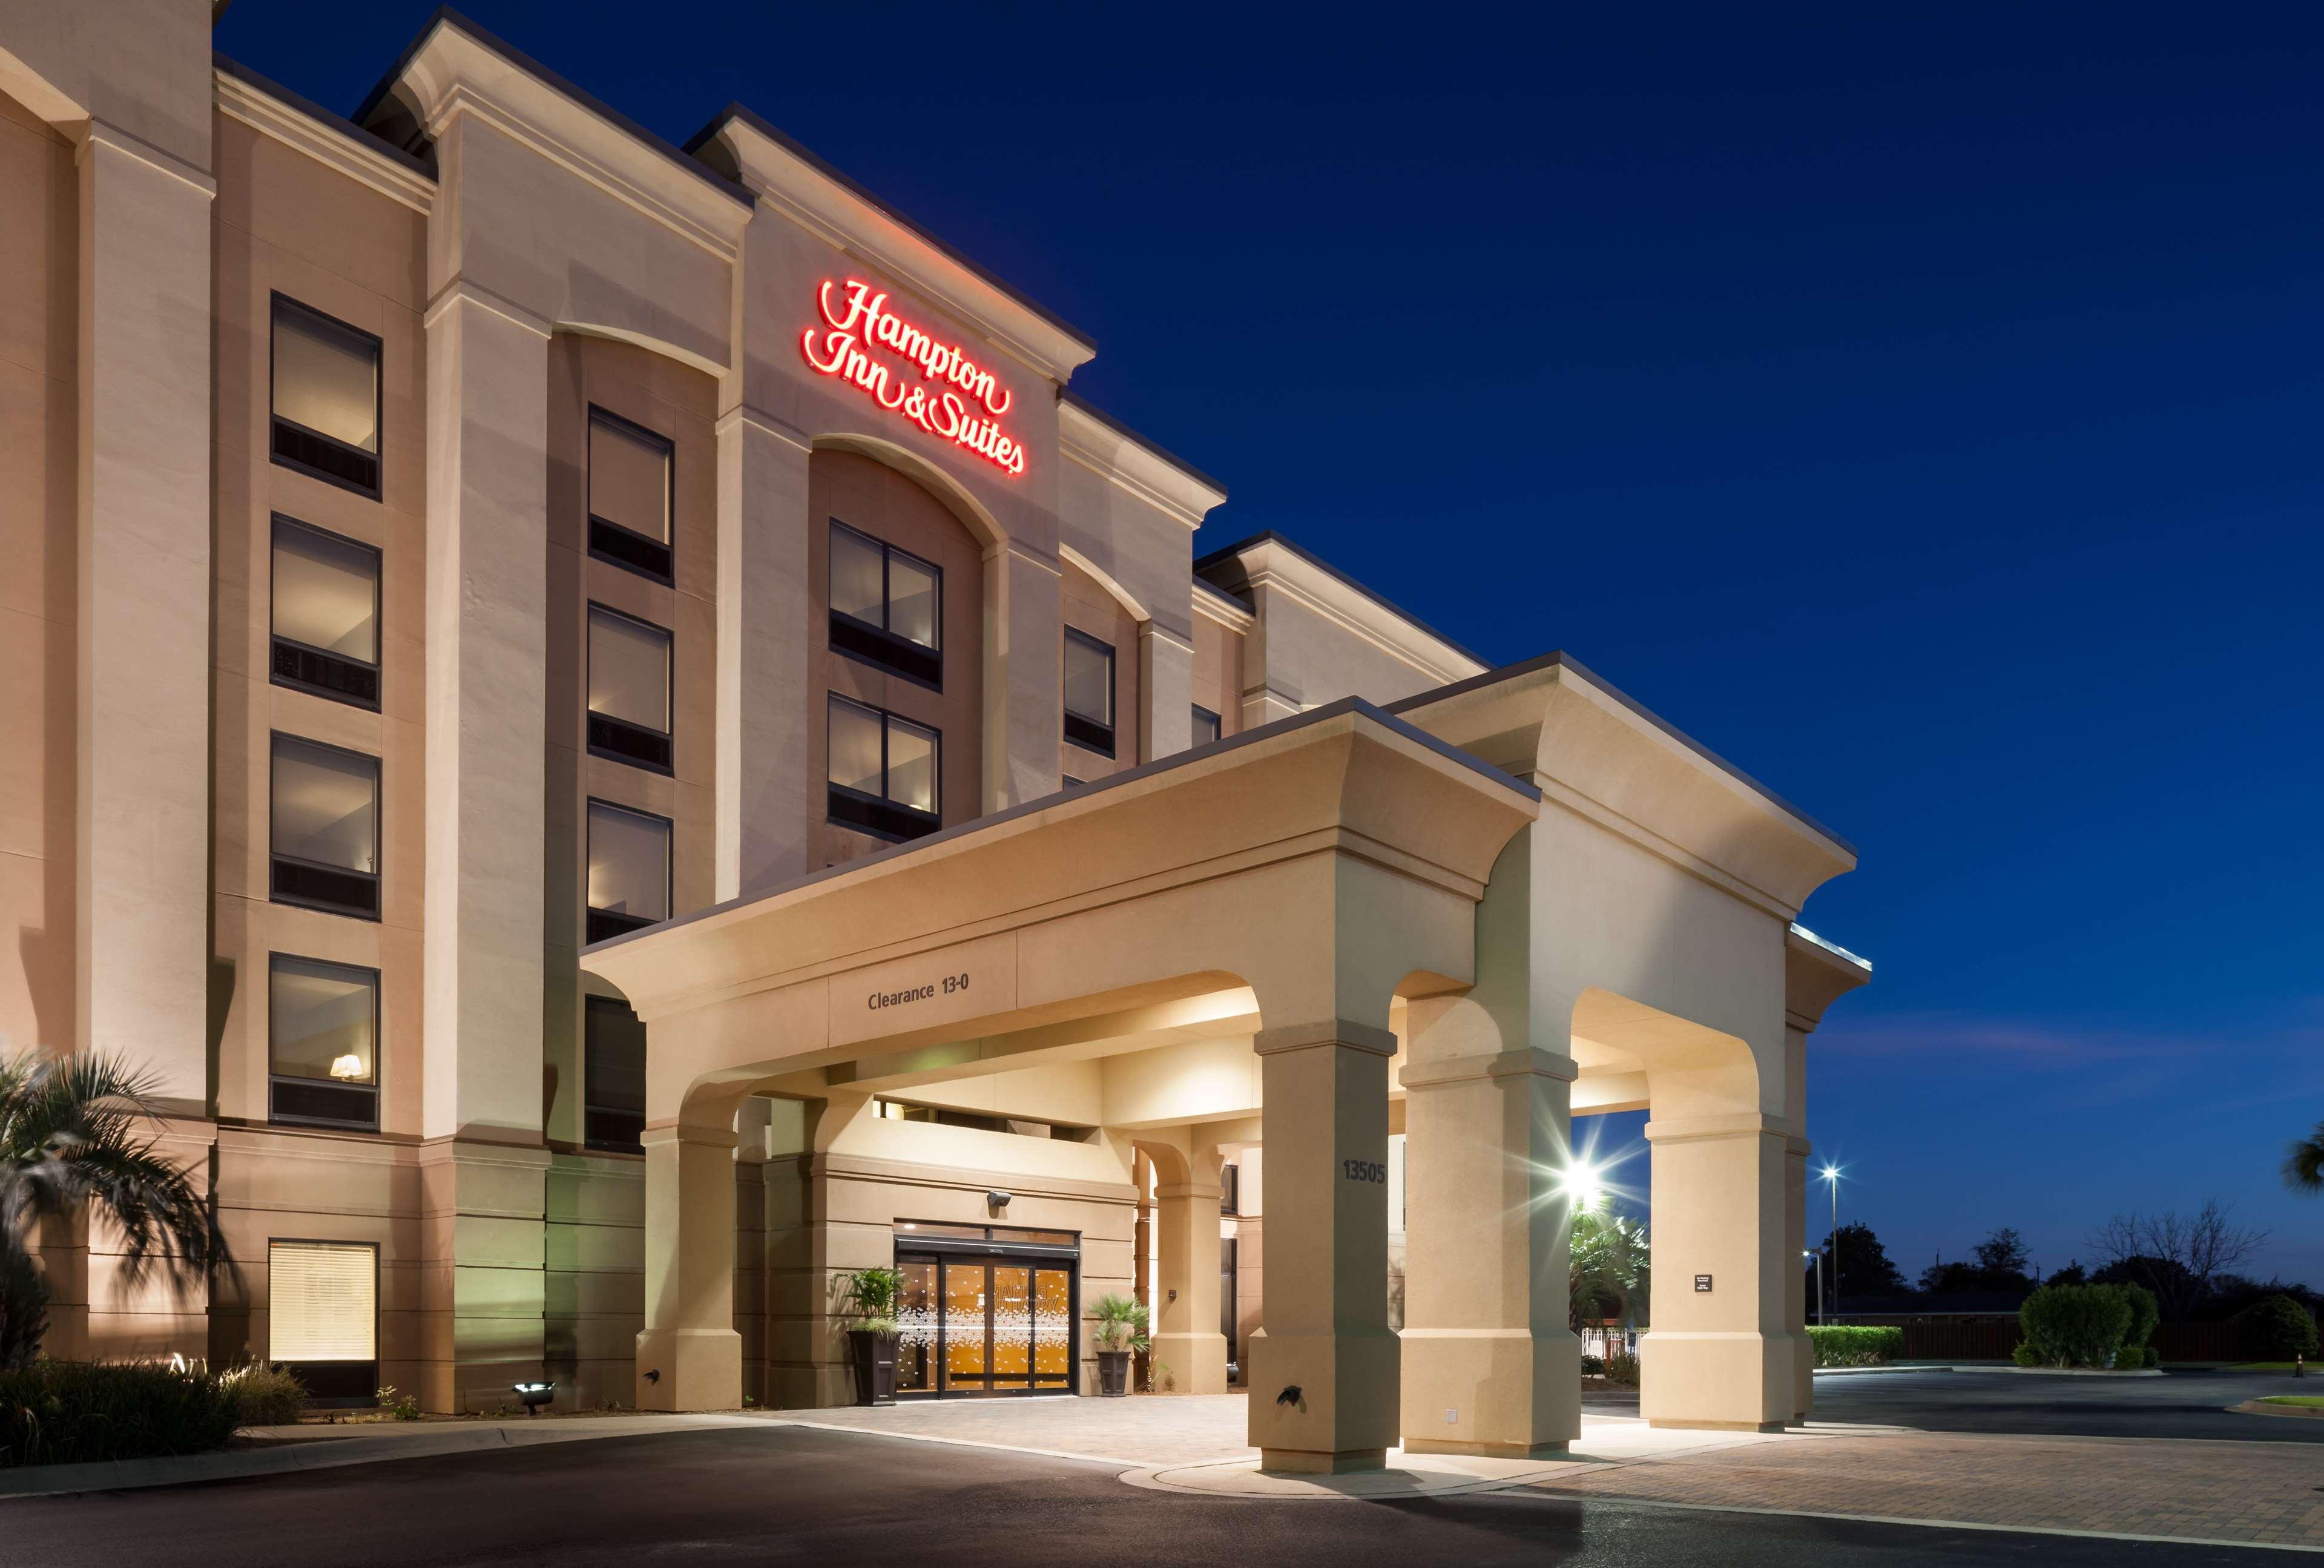 Hampton Inn & Suites Panama City Beach-Pier Park Area image 1